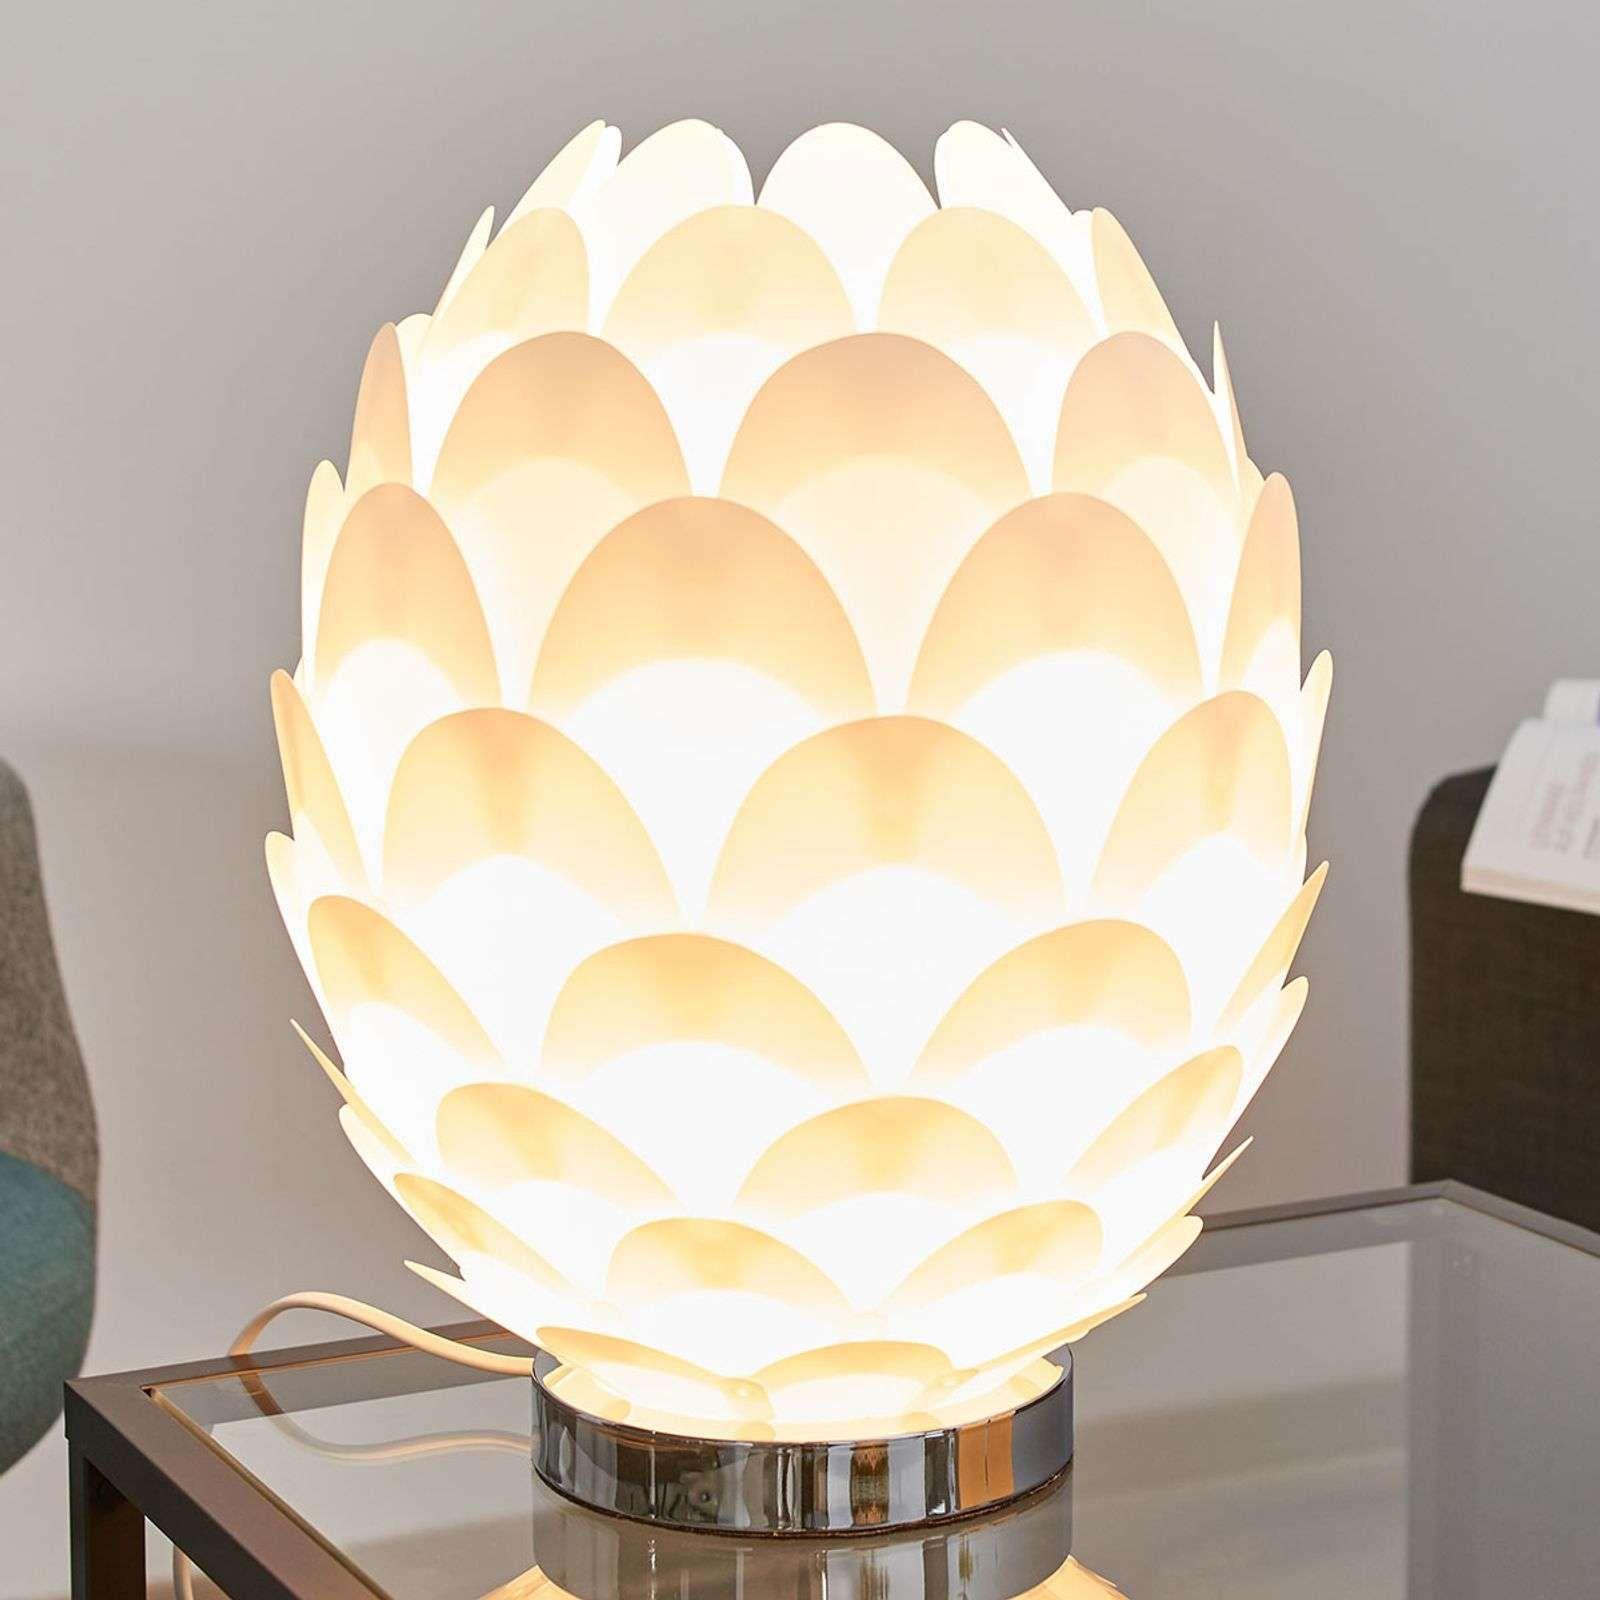 Lamp Led Design Bureaulamp Industrieel Kwantum Tafellamp Houten Takken Staande Schemerlampen Karwei Lamp H Tafellamp Indirecte Verlichting Lampen Maken